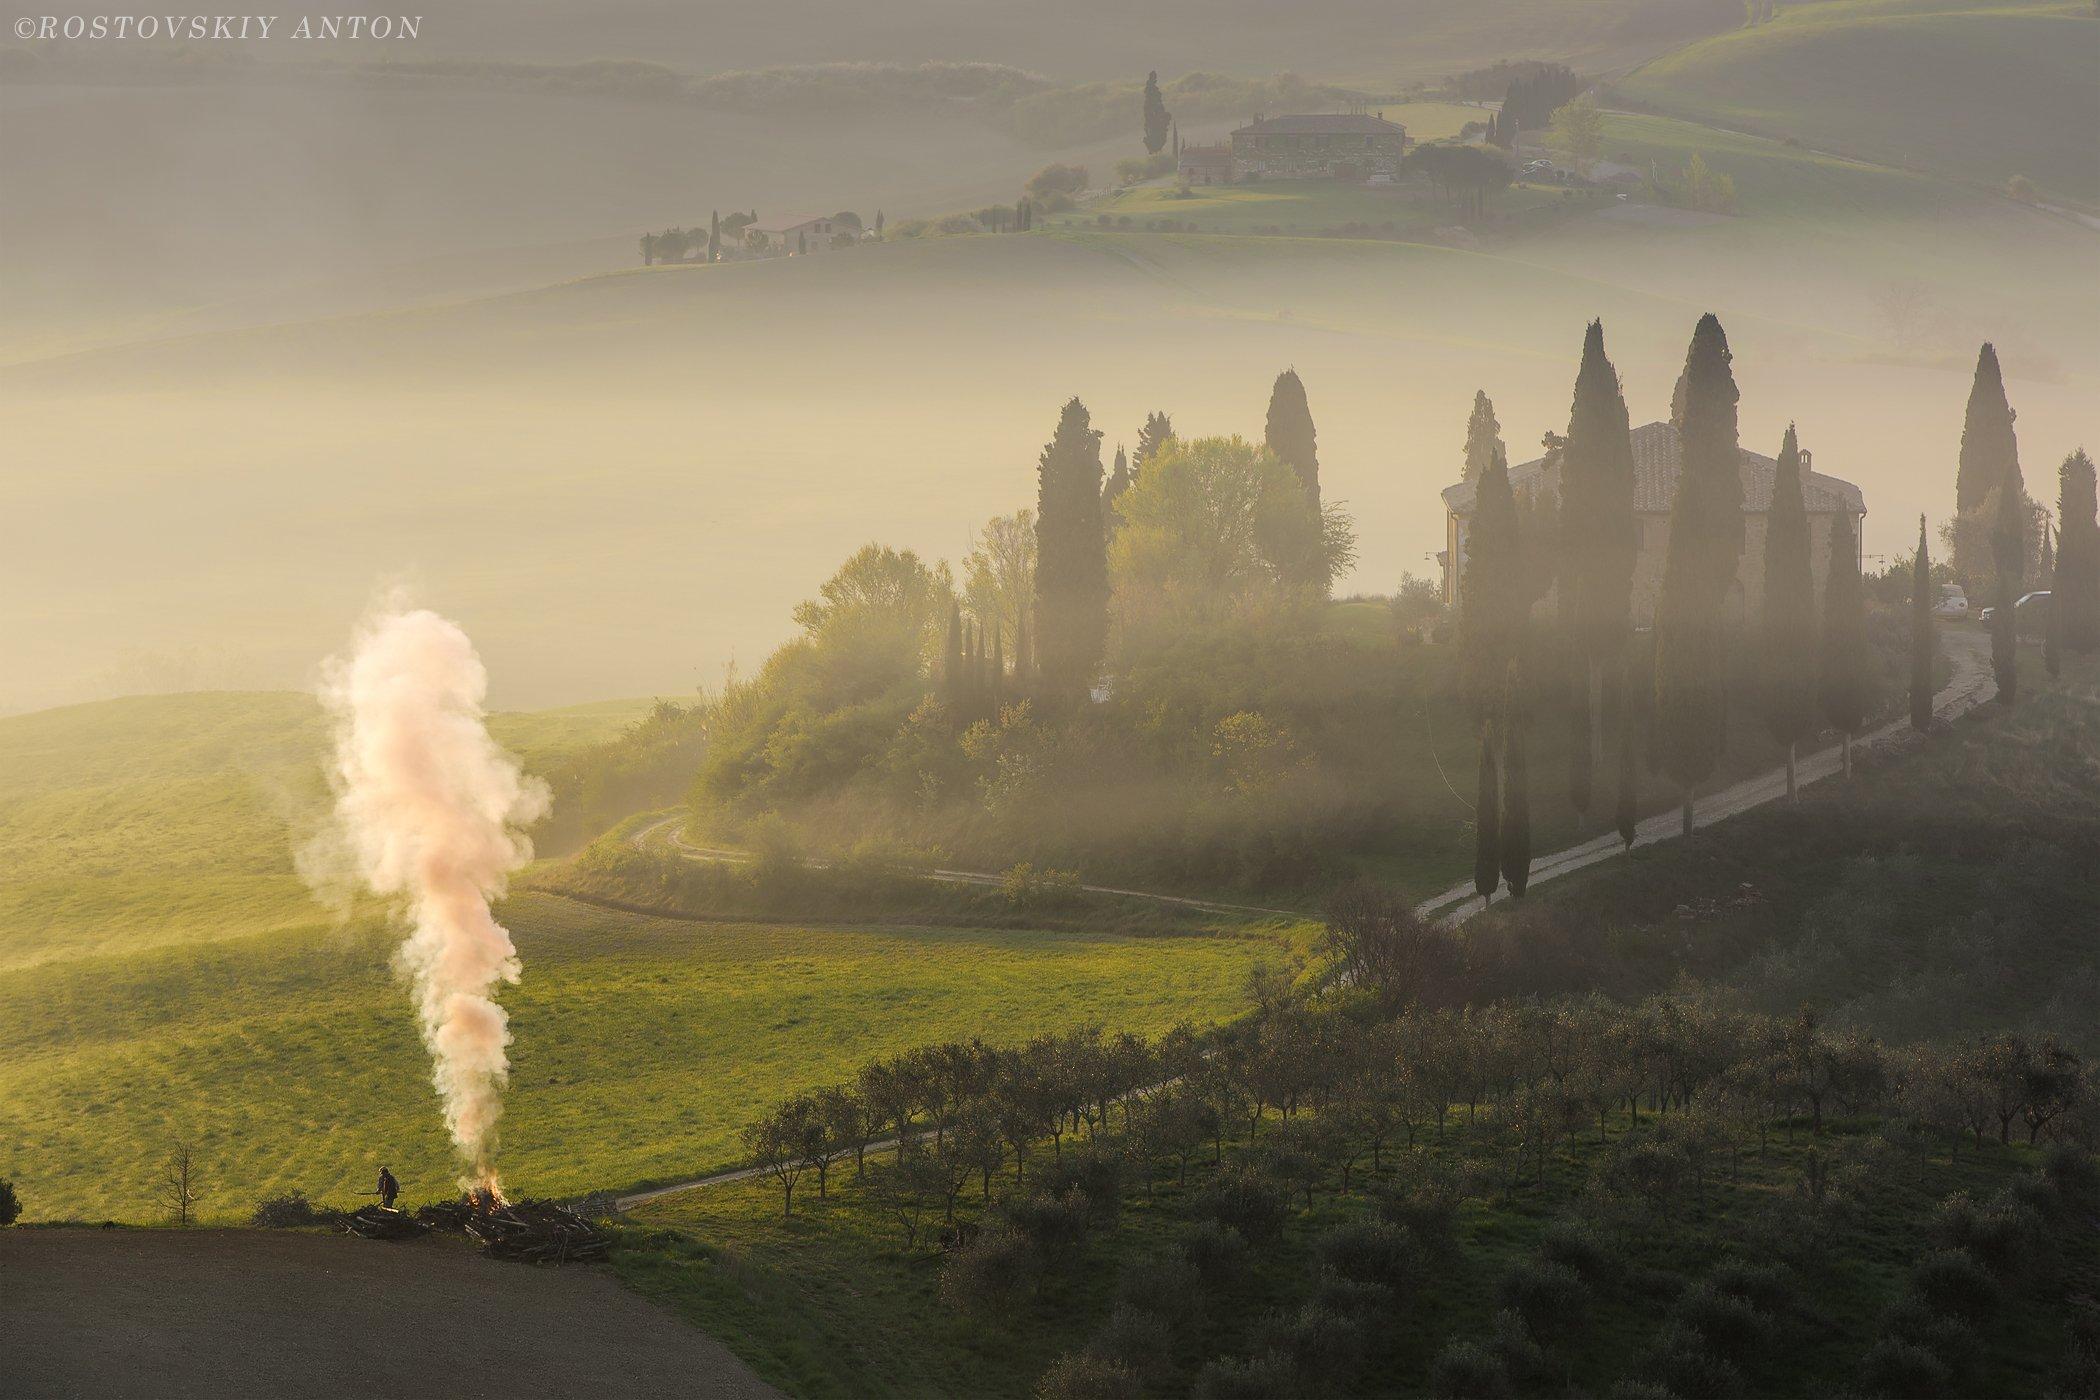 Тоскана, фототур в тоскану, Италия, фототур в Италия, Рассвет, Туман, утро, Tuscany landscape, Tuscany, Italy, Антон Ростовский